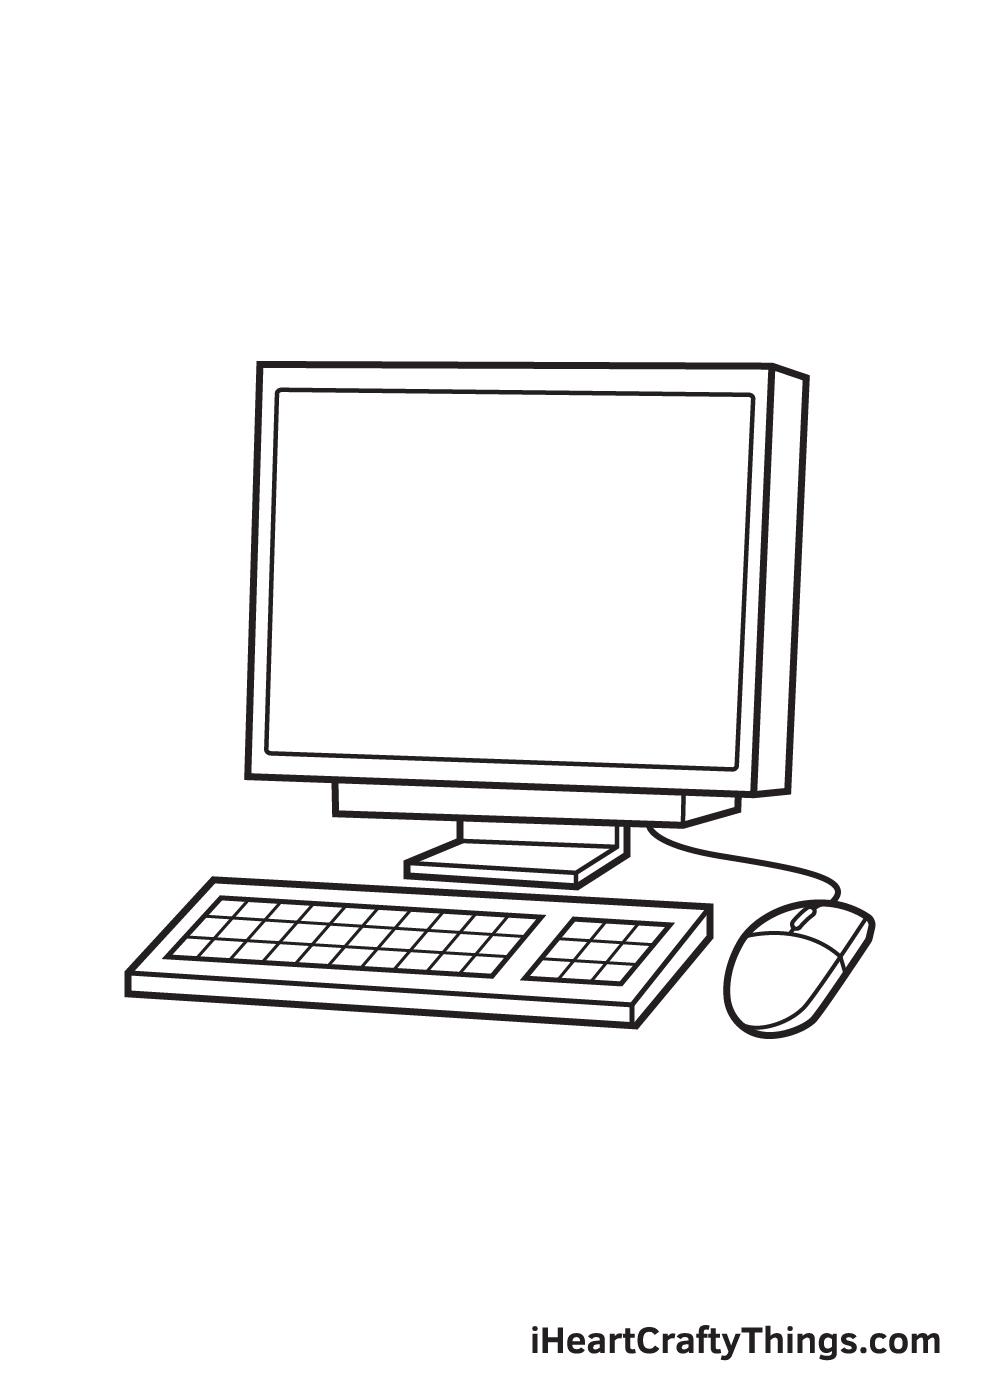 computer drawing - step 8